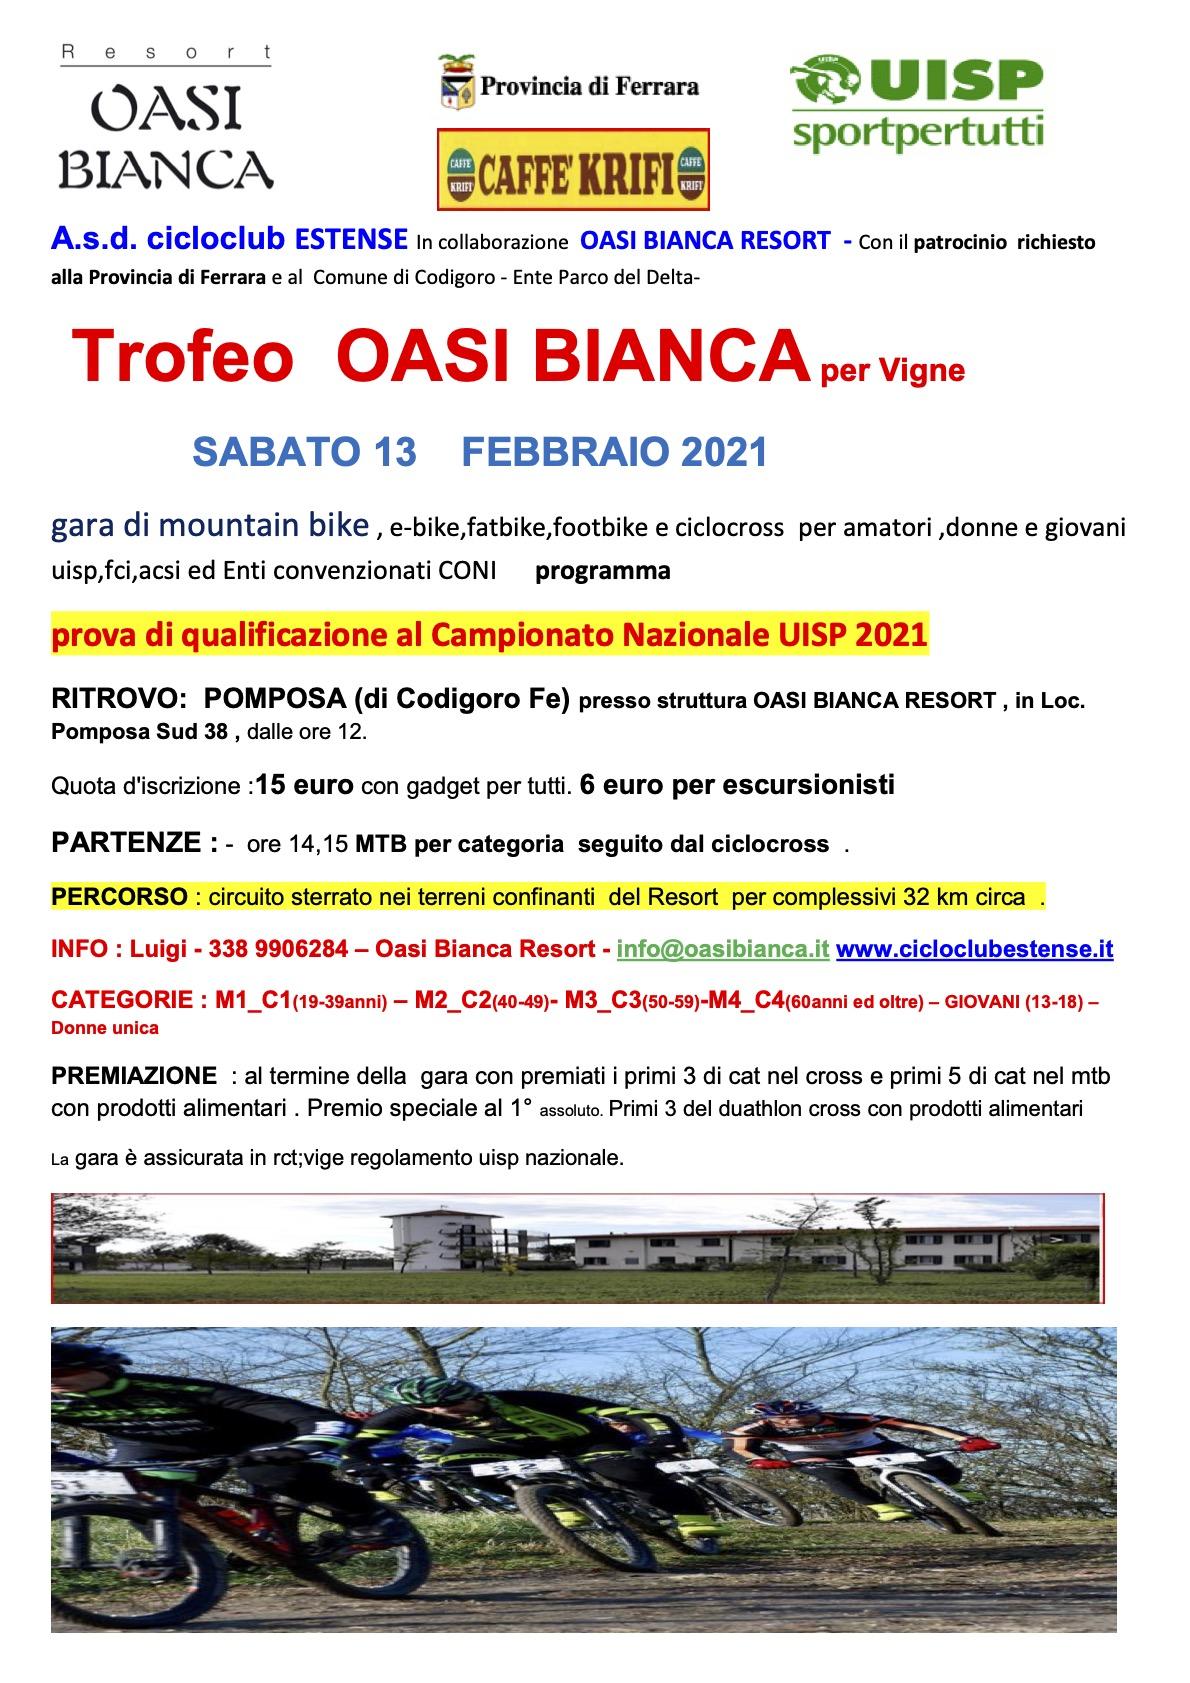 mtb_pomposa_oasi_bianca_13_febbraio_2021